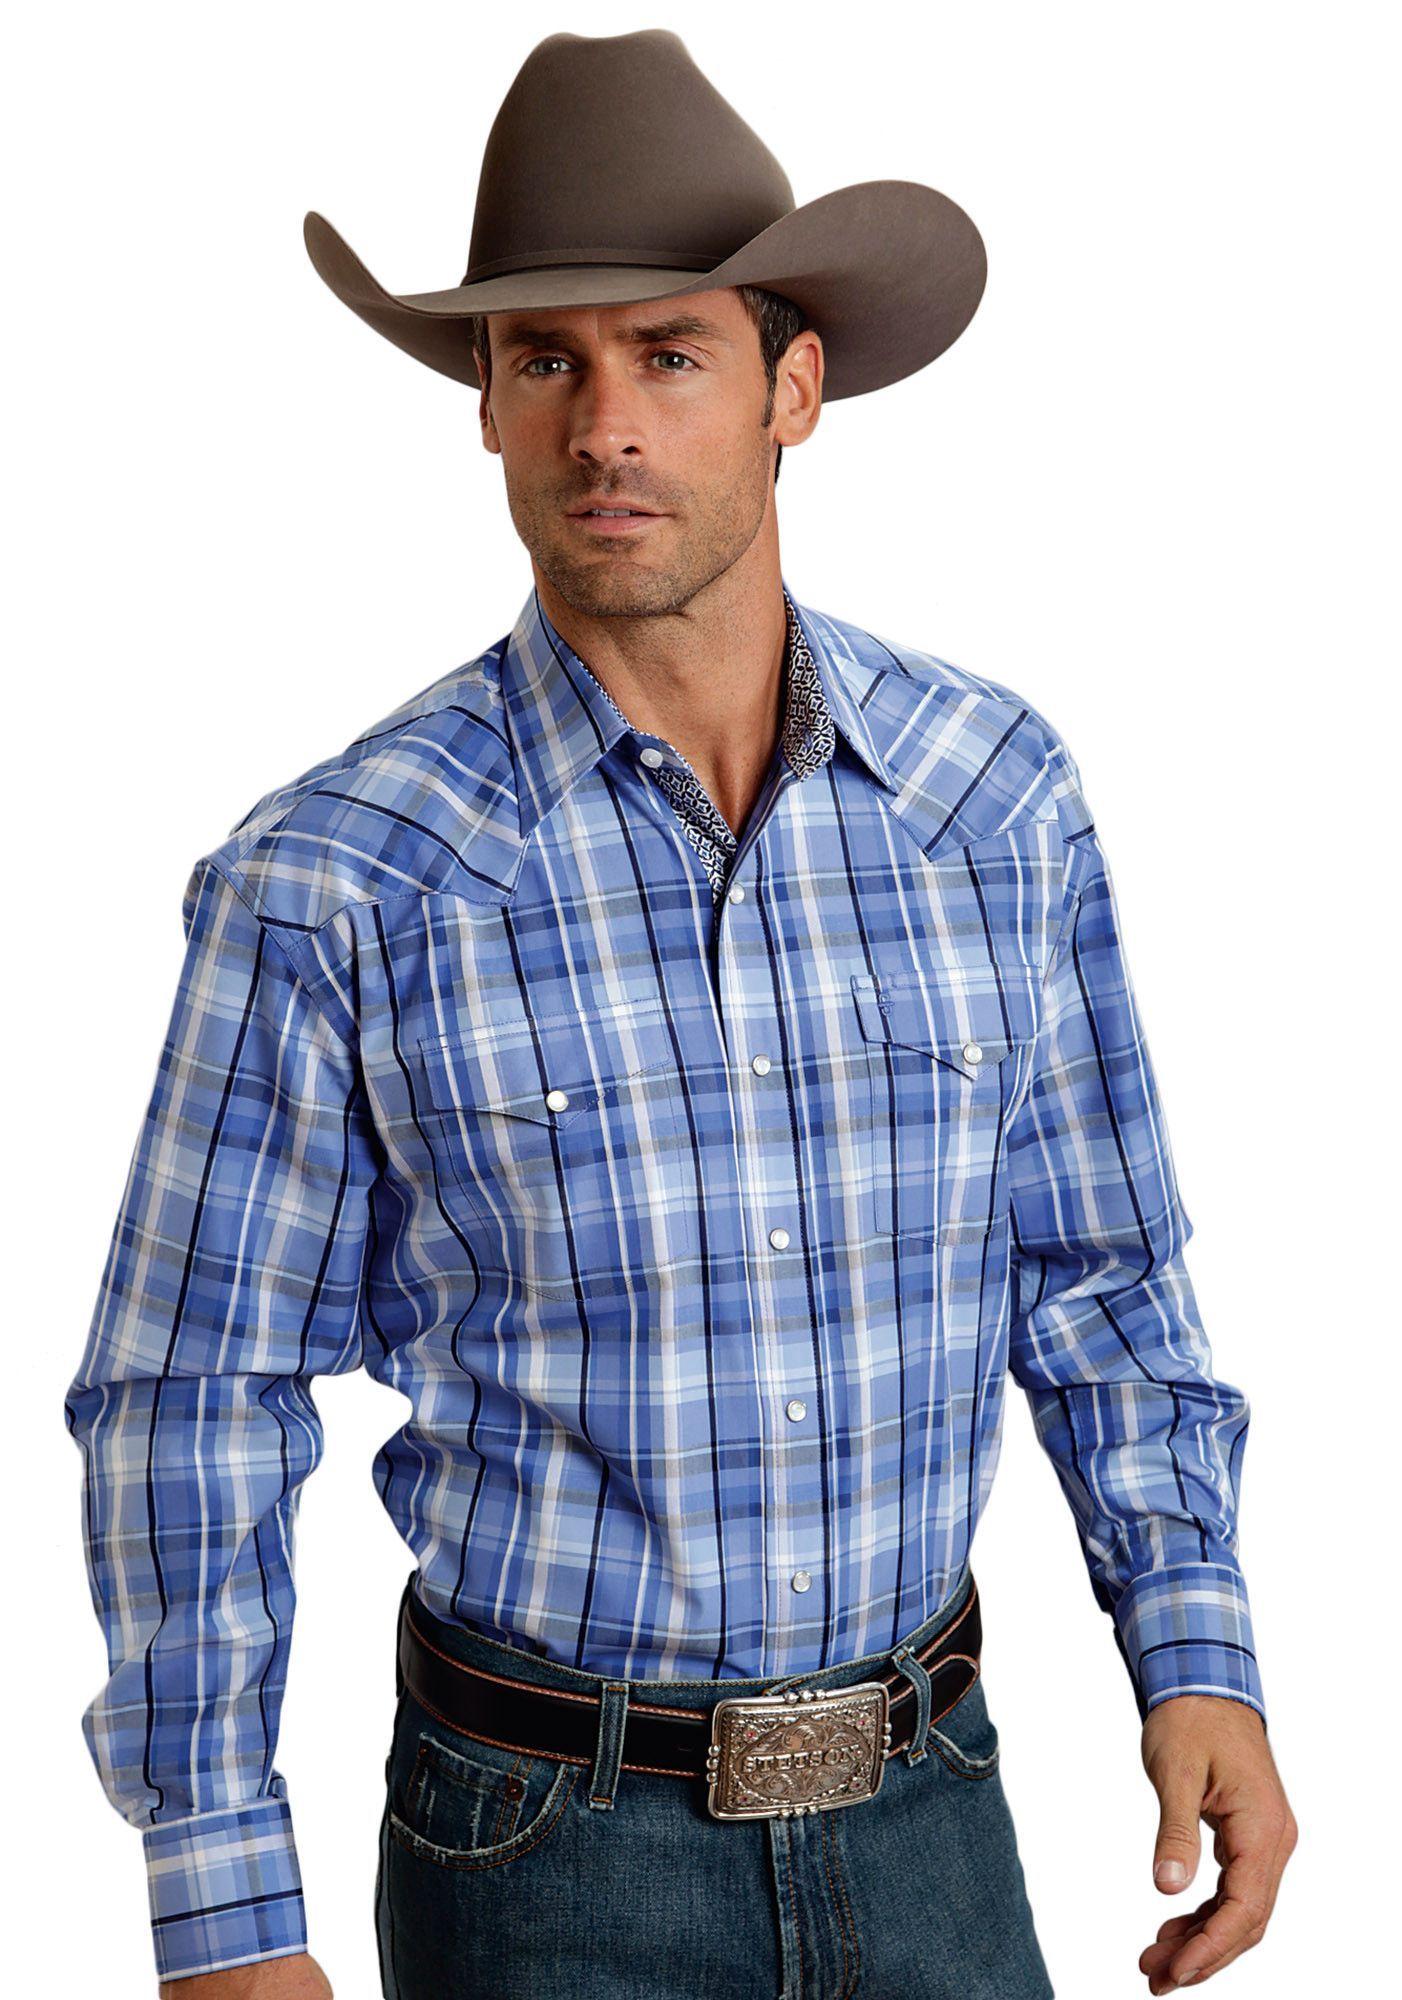 Stetson Mens Squared Off Plaid Flat Weave W/satin I - Blue Group Long Sleeve Shirt Snap Closure - 2 Pocket